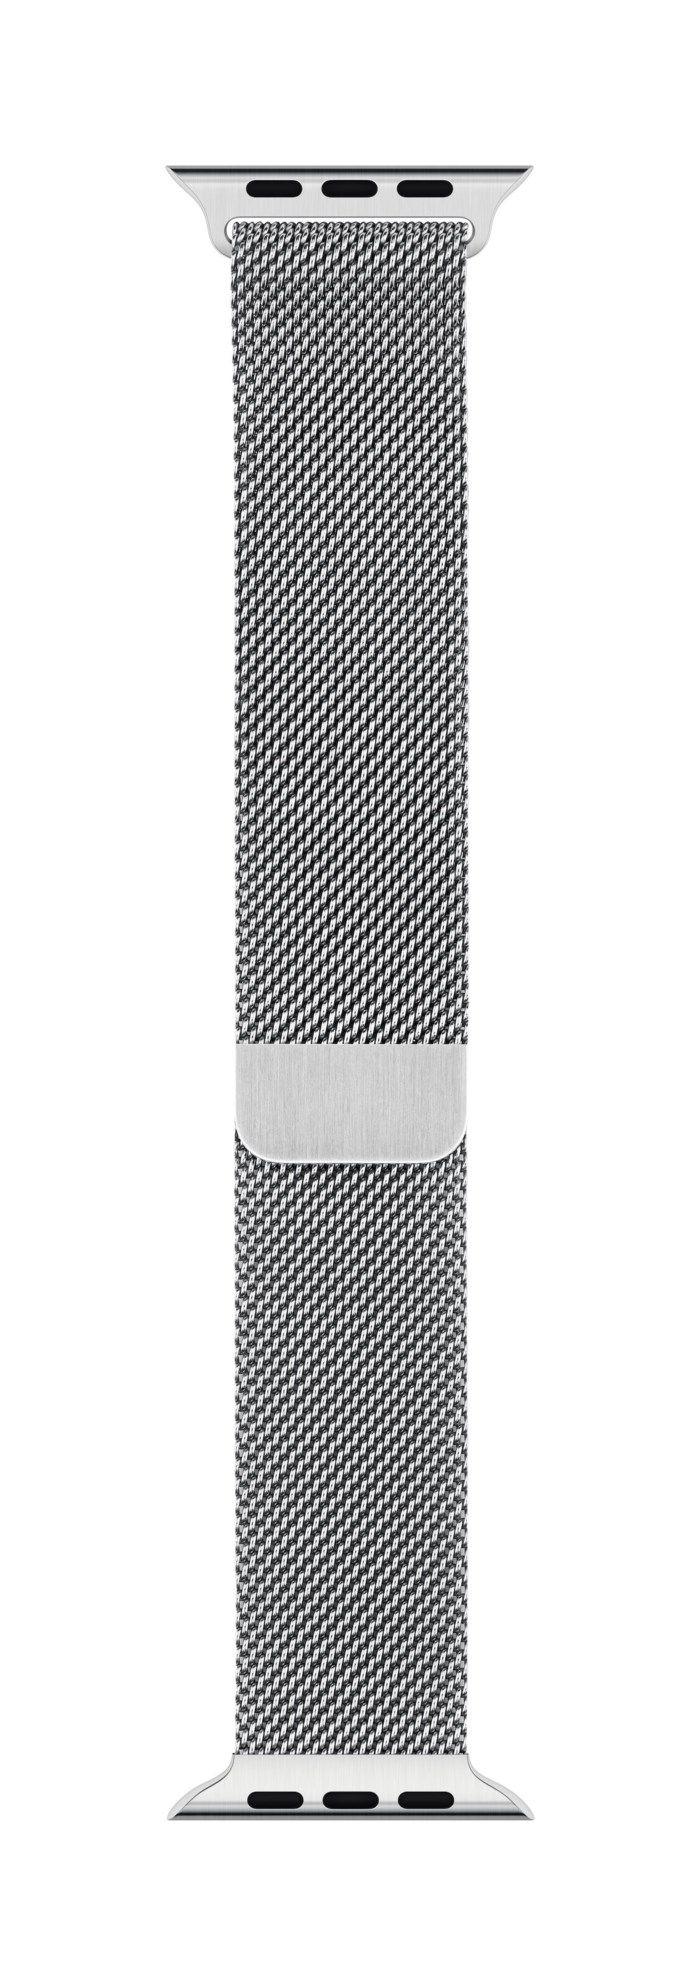 Apple Milanesisk loop till 42/44 mm Apple Watch Silver